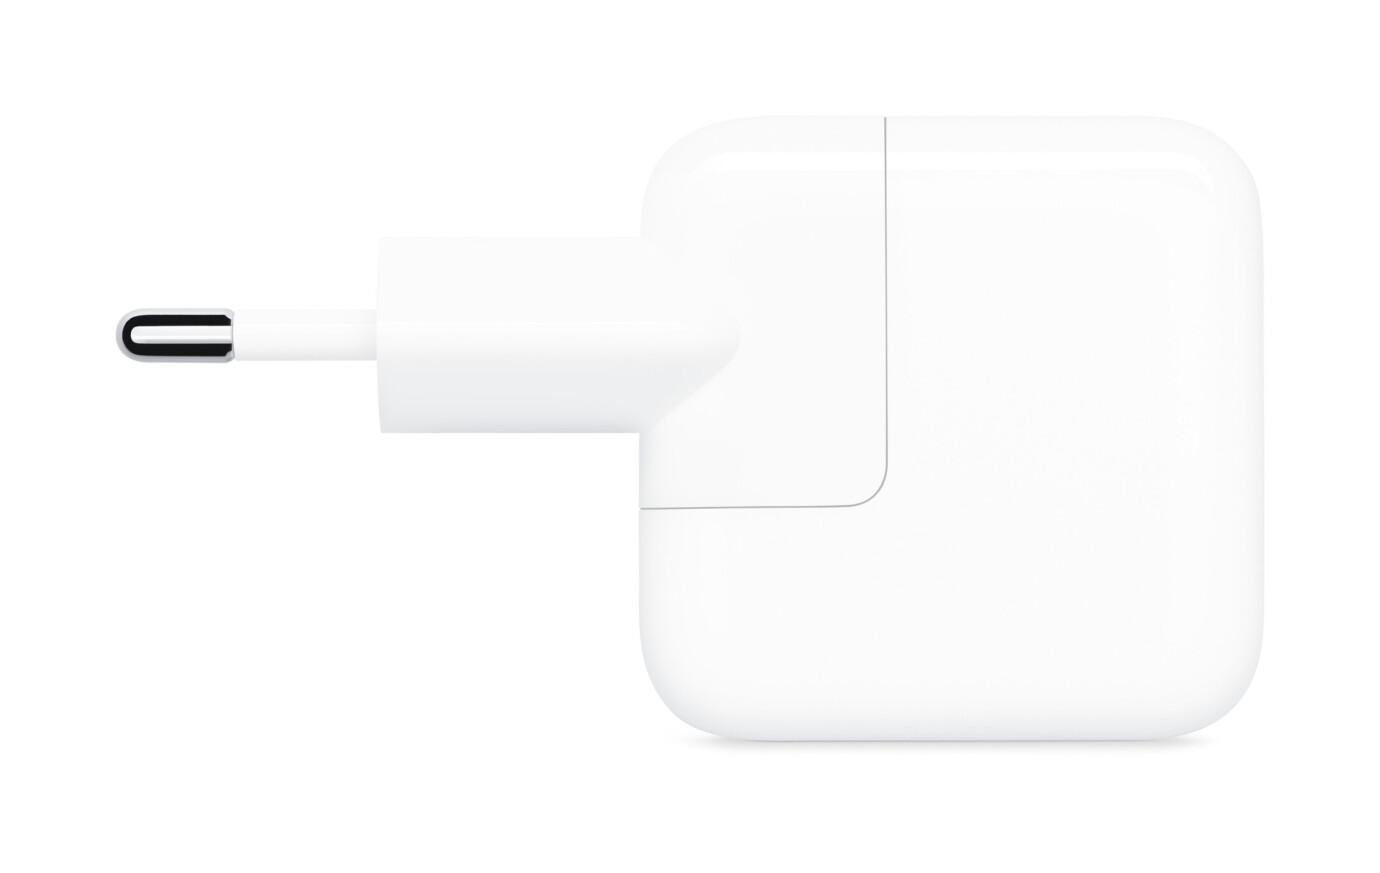 Apple USB Power Adapter 12W